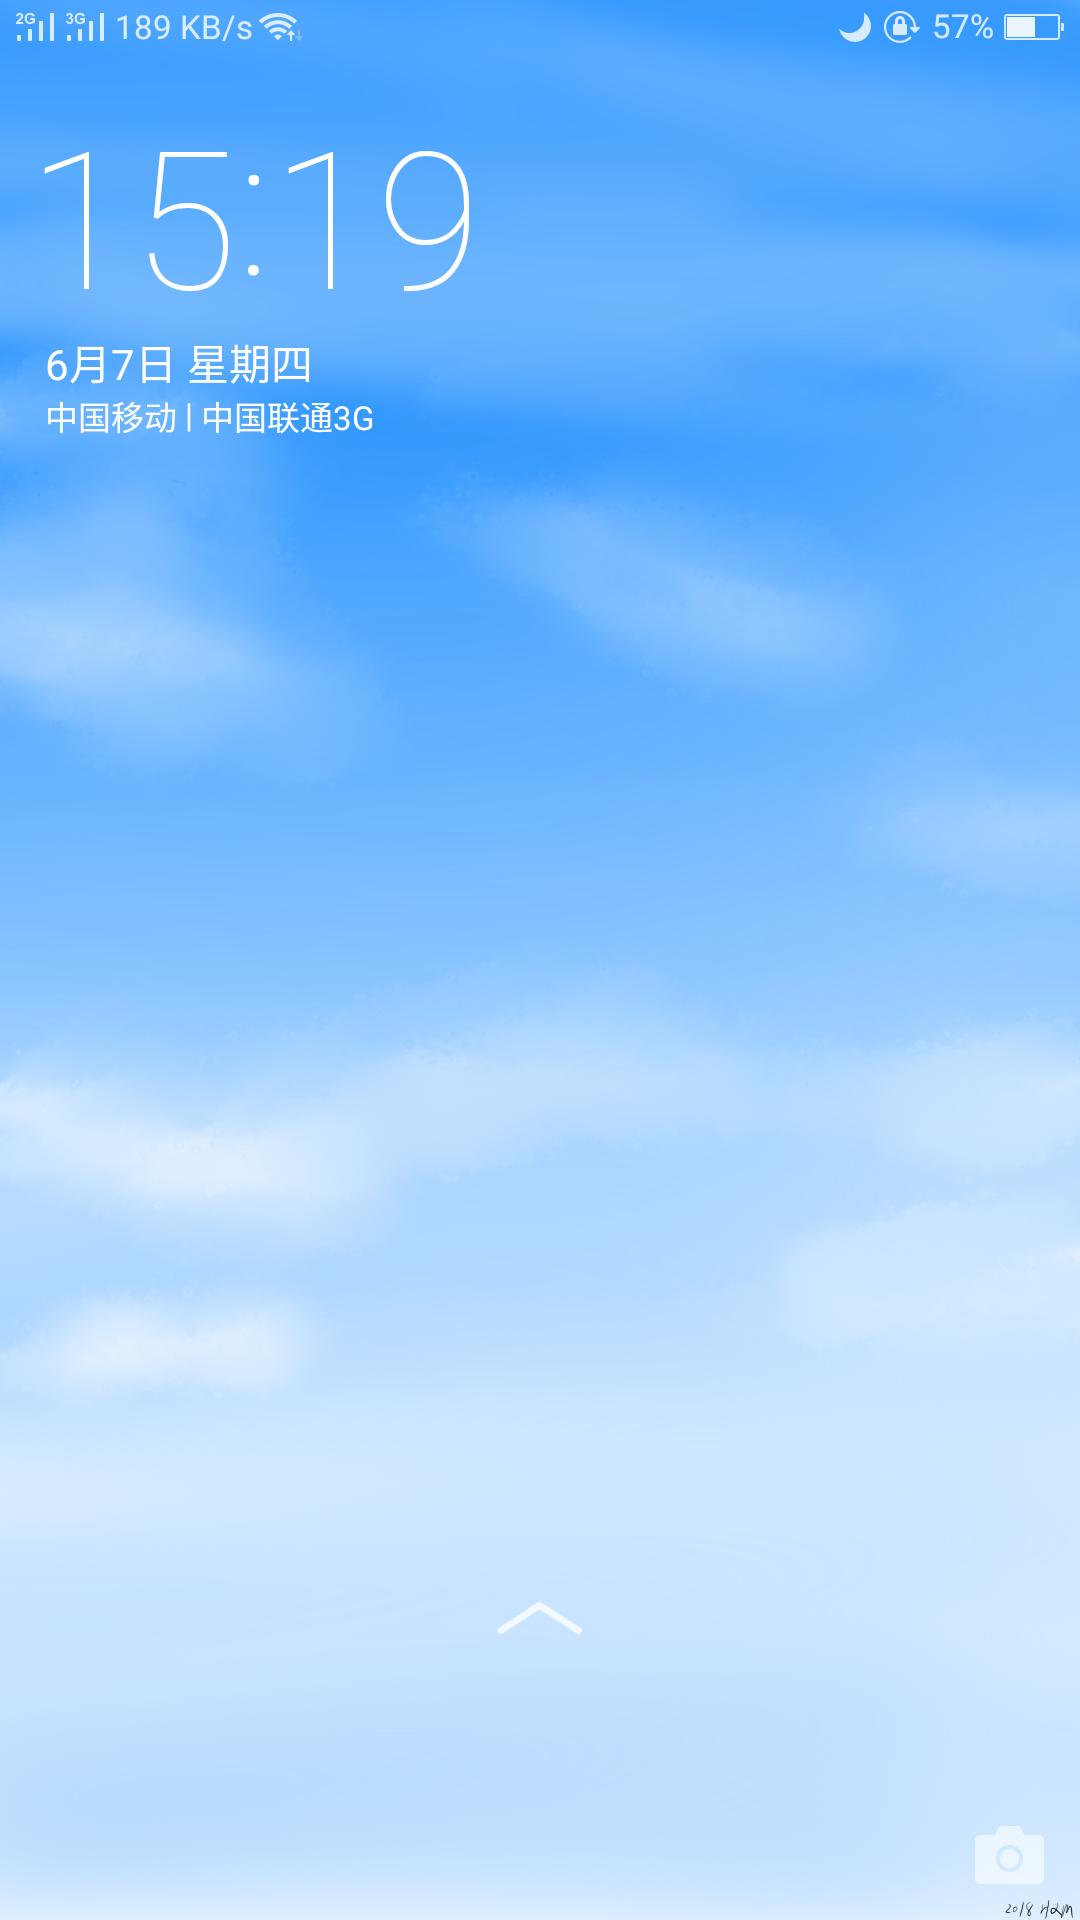 Screenshot_2018-06-07-15-19-00-65.png